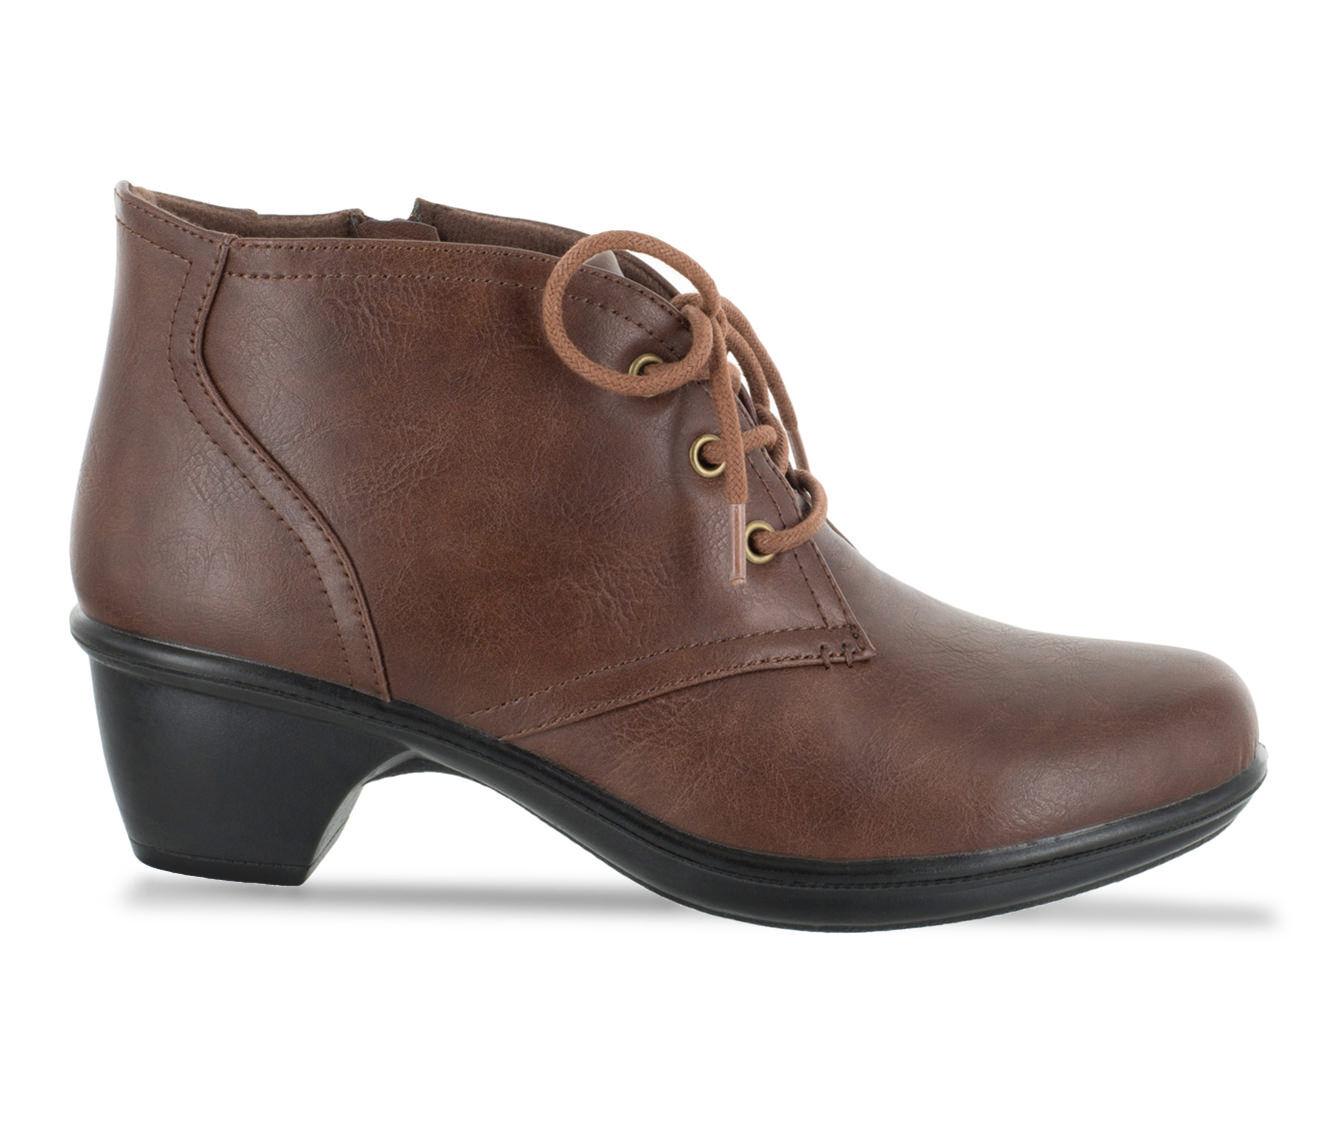 For Sale Popular Women's Easy Street Debbie Shoes Mid Brown